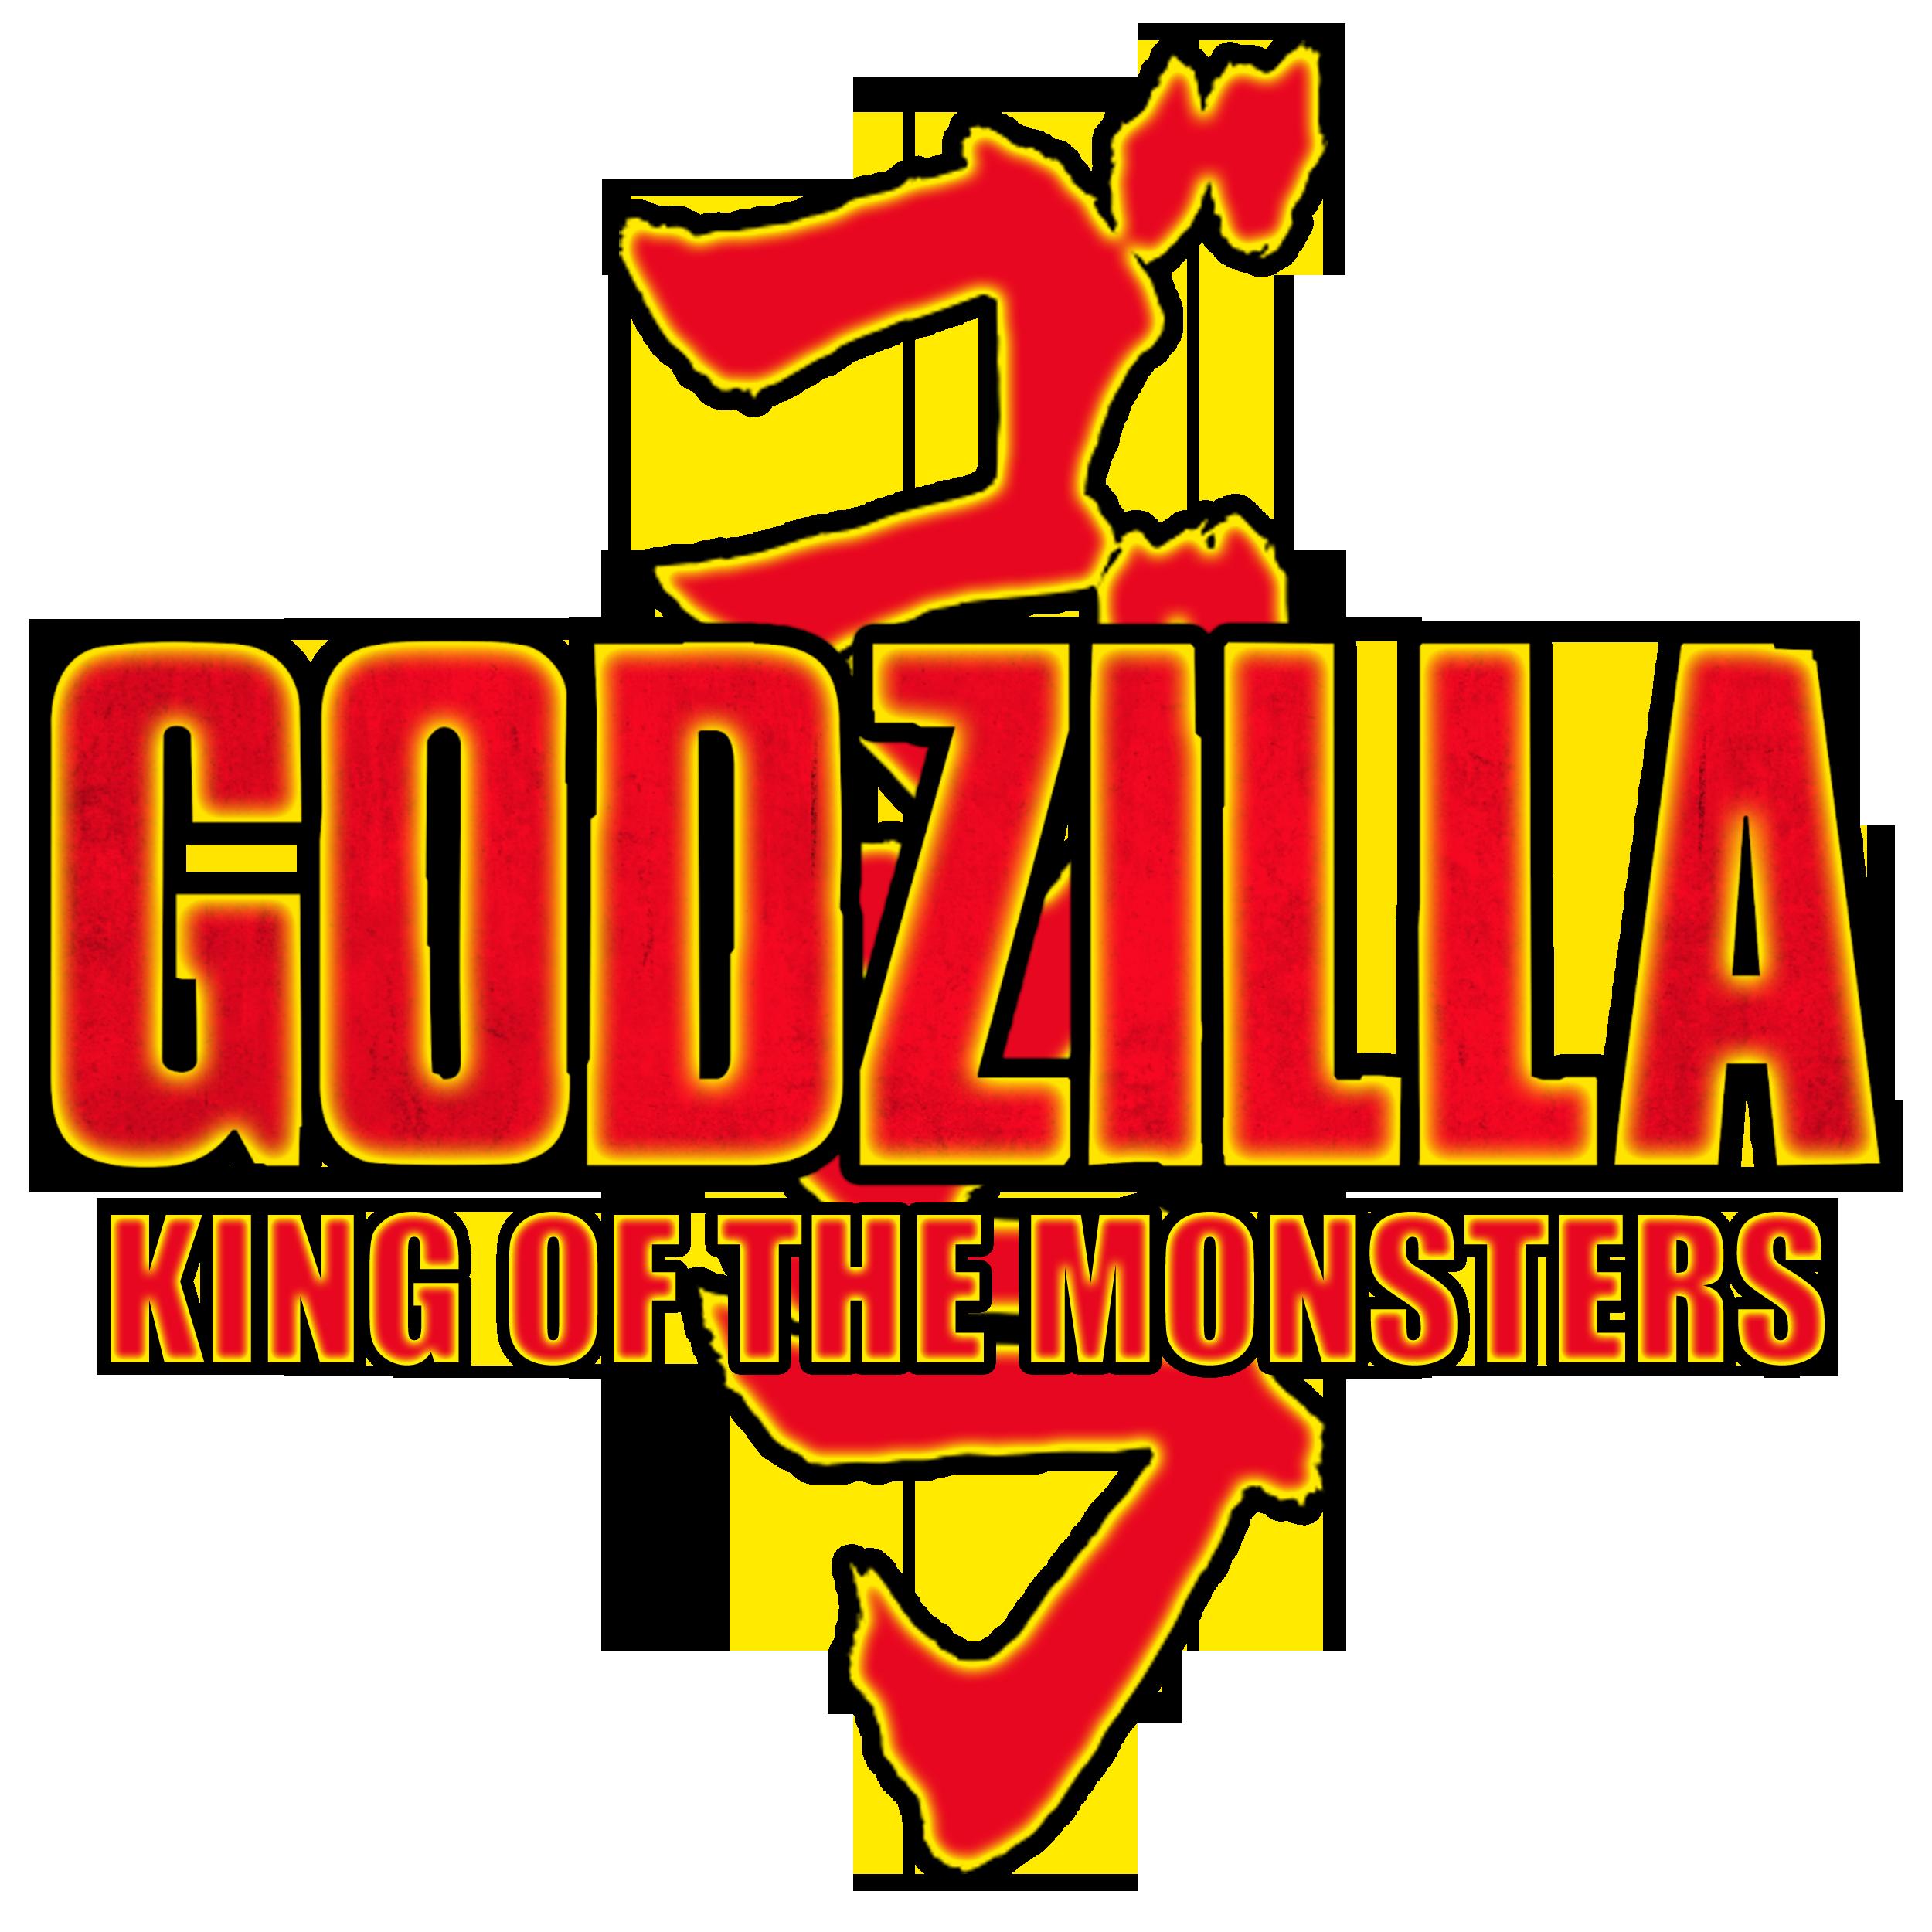 Godzilla - King of the Monsters Logo